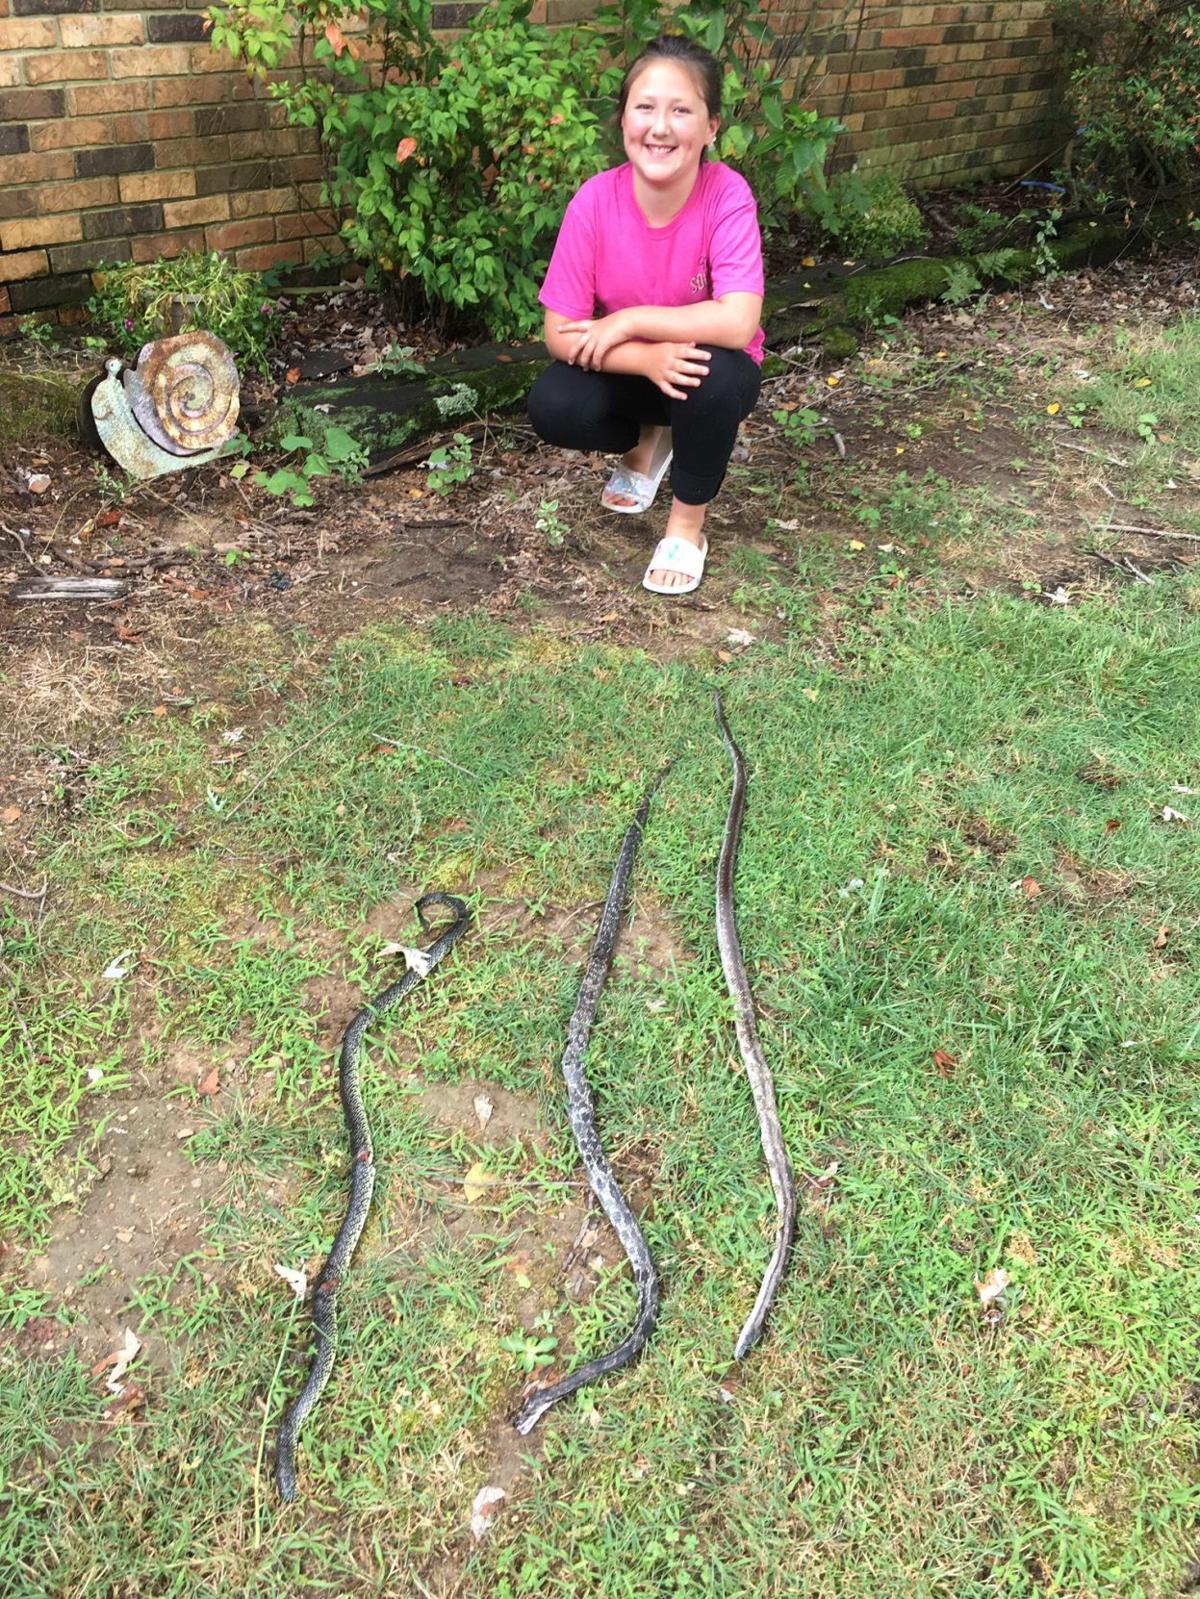 Tinsli and Snakes